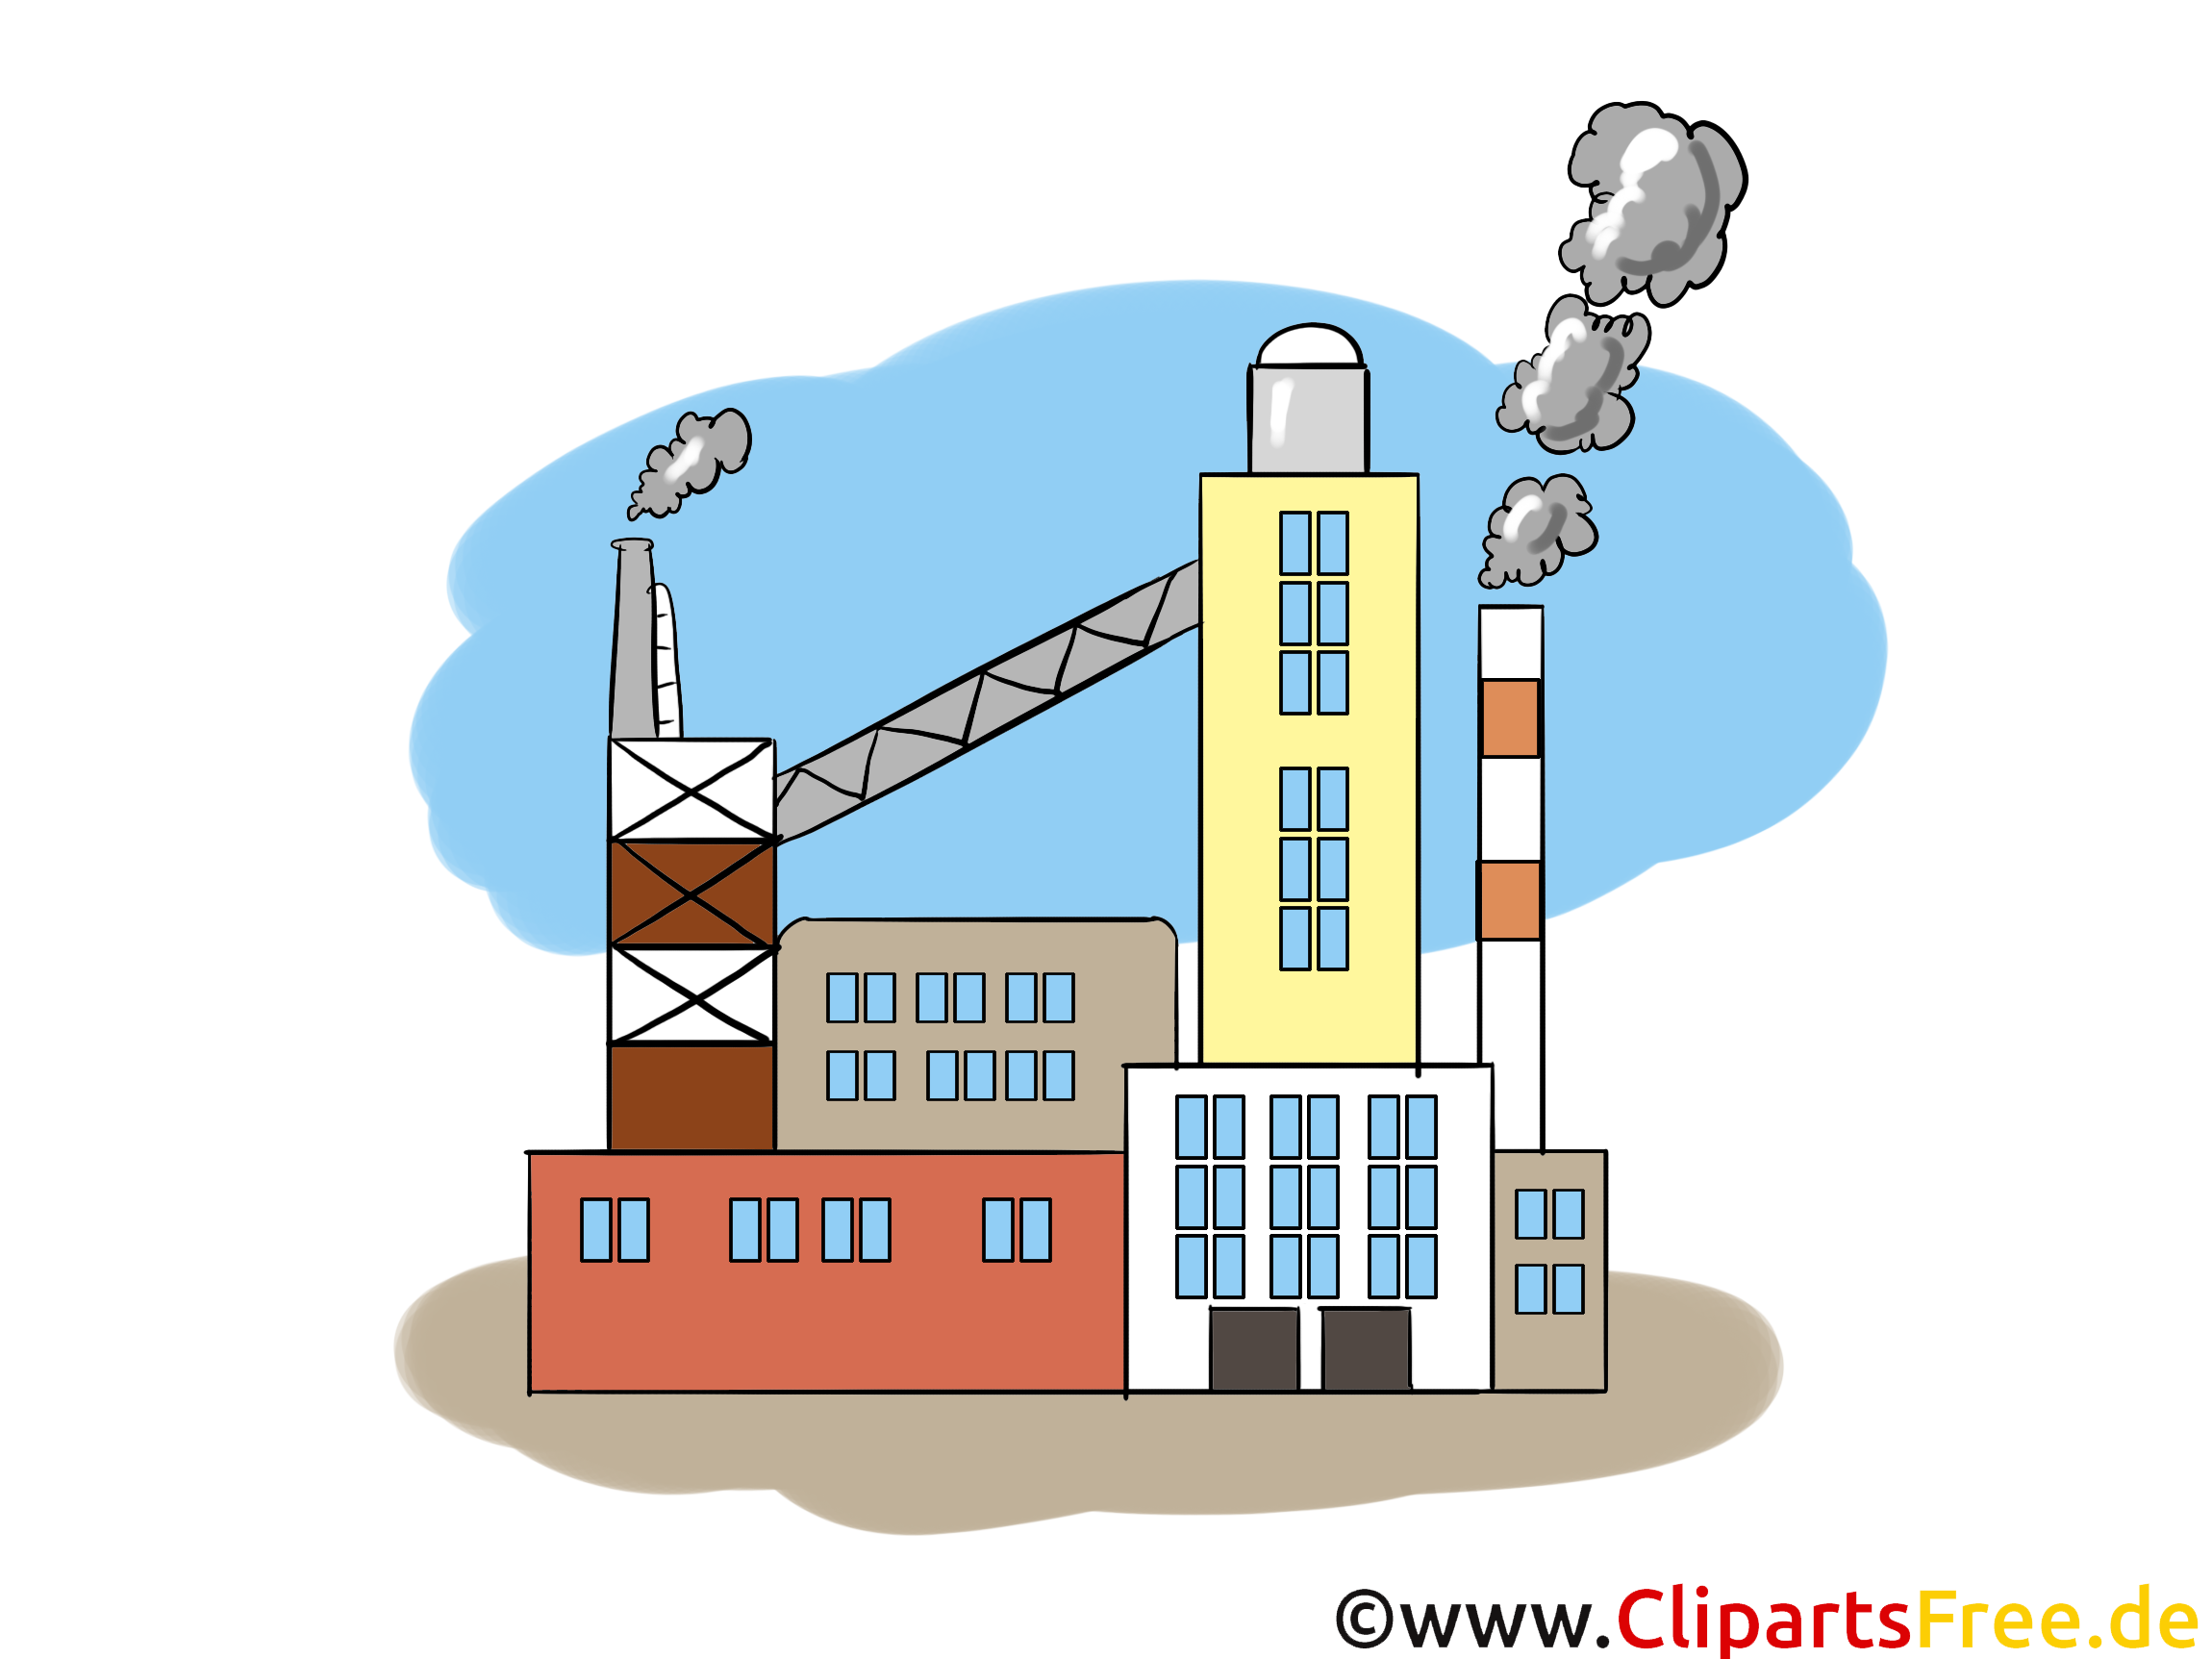 usine image industrie images cliparts industrie banque creation clip art pictures creation clip art for kids